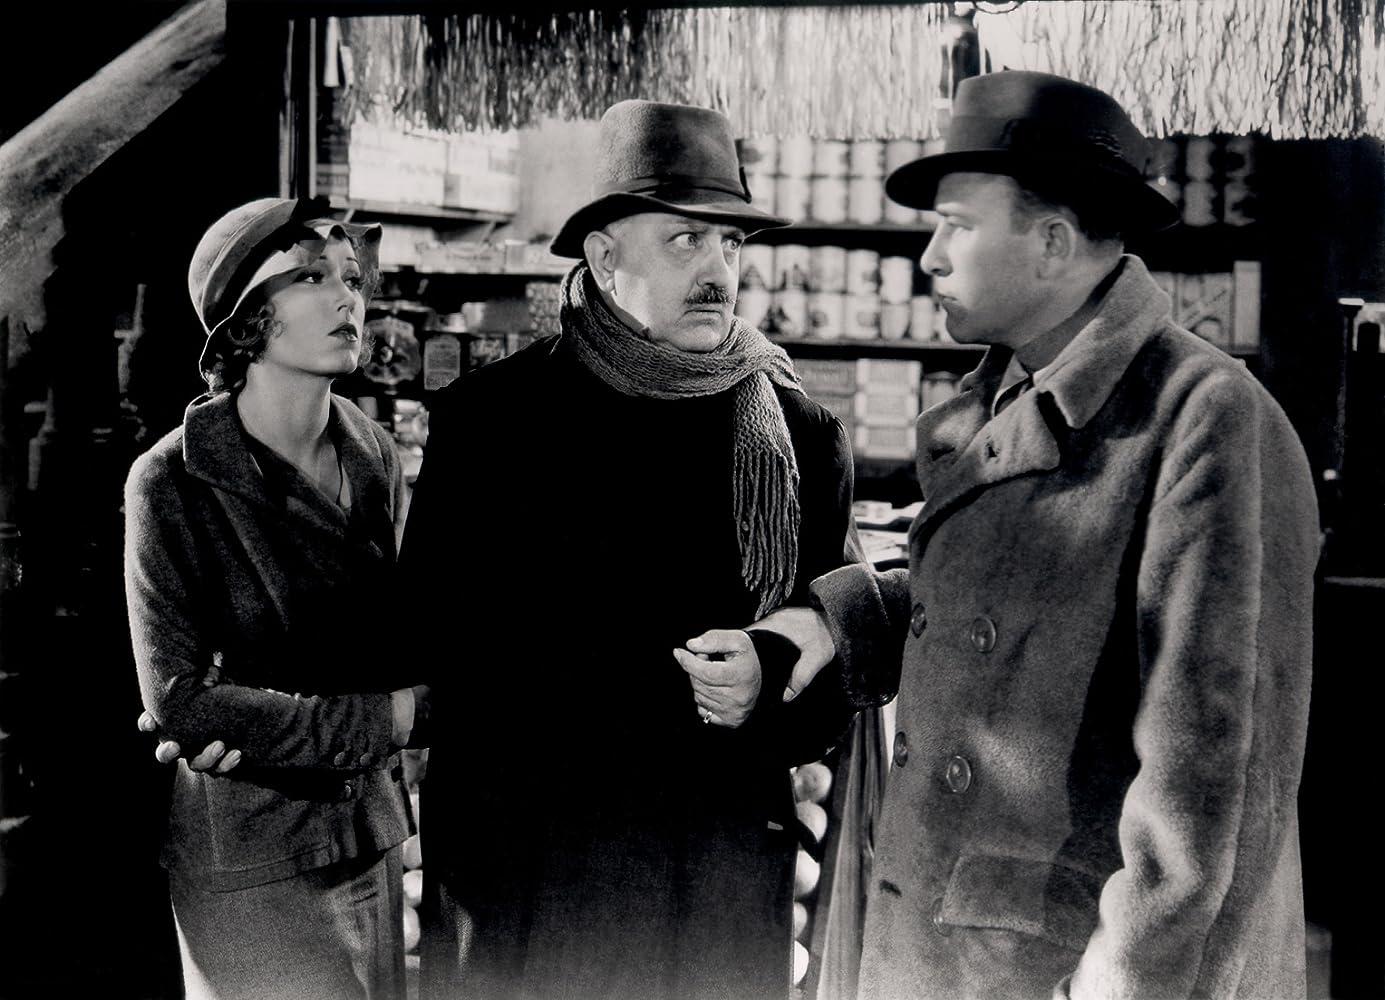 Robert Armstrong, Paul Porcasi, and Fay Wray in King Kong (1933)